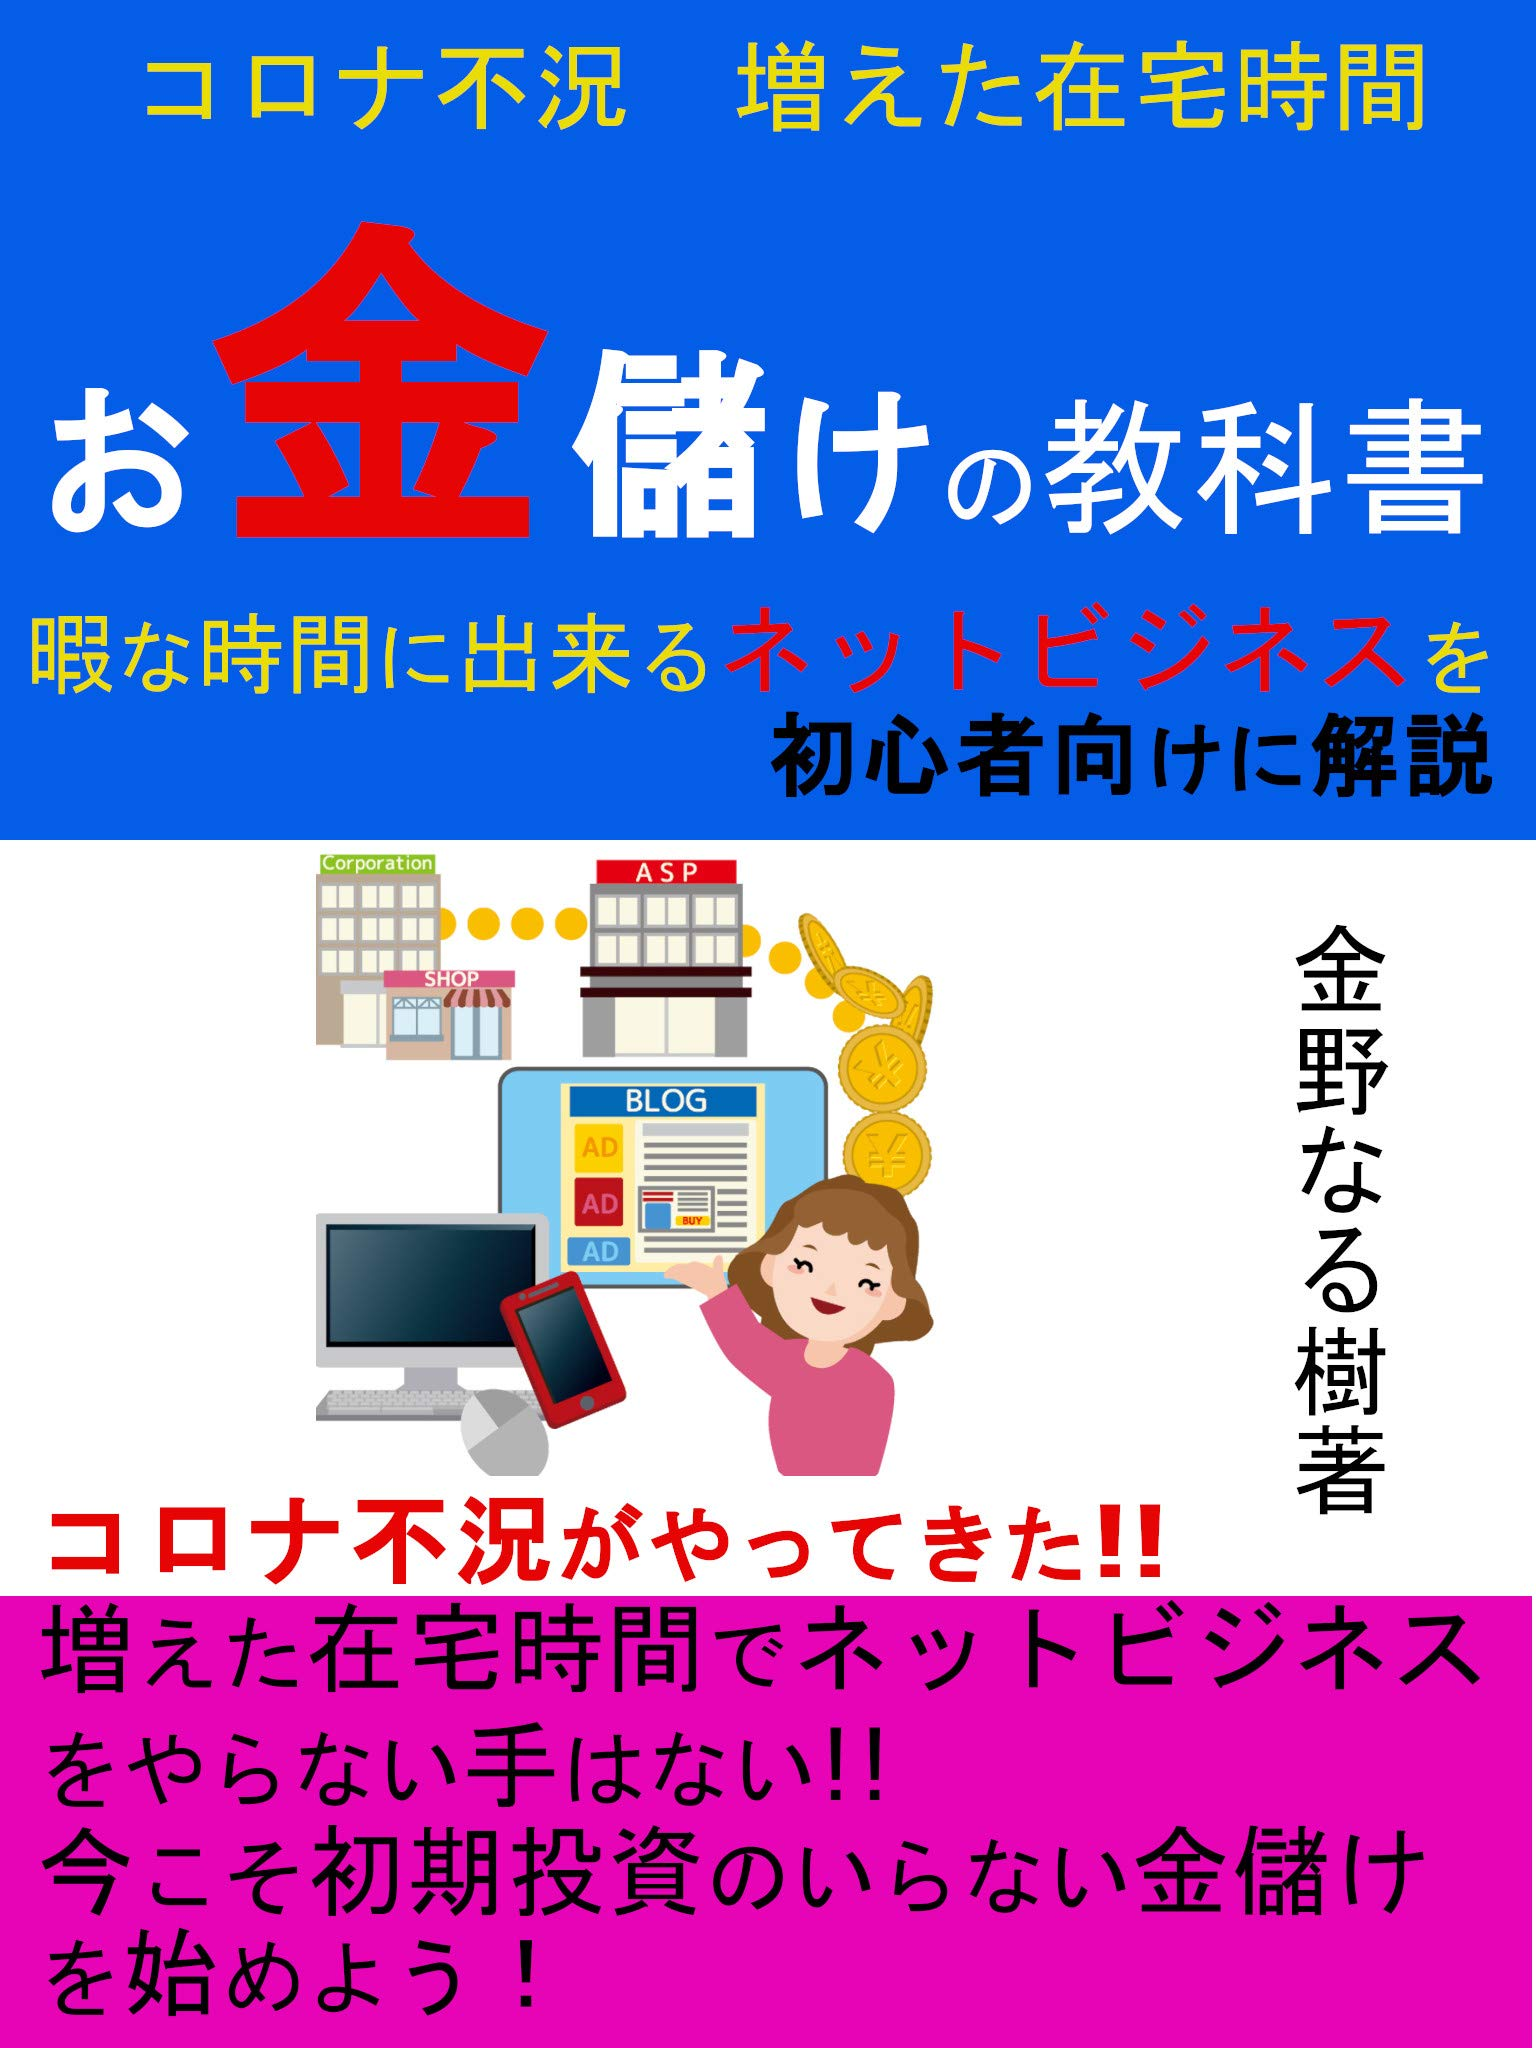 okanemoukenokyoukasyo (Japanese Edition)